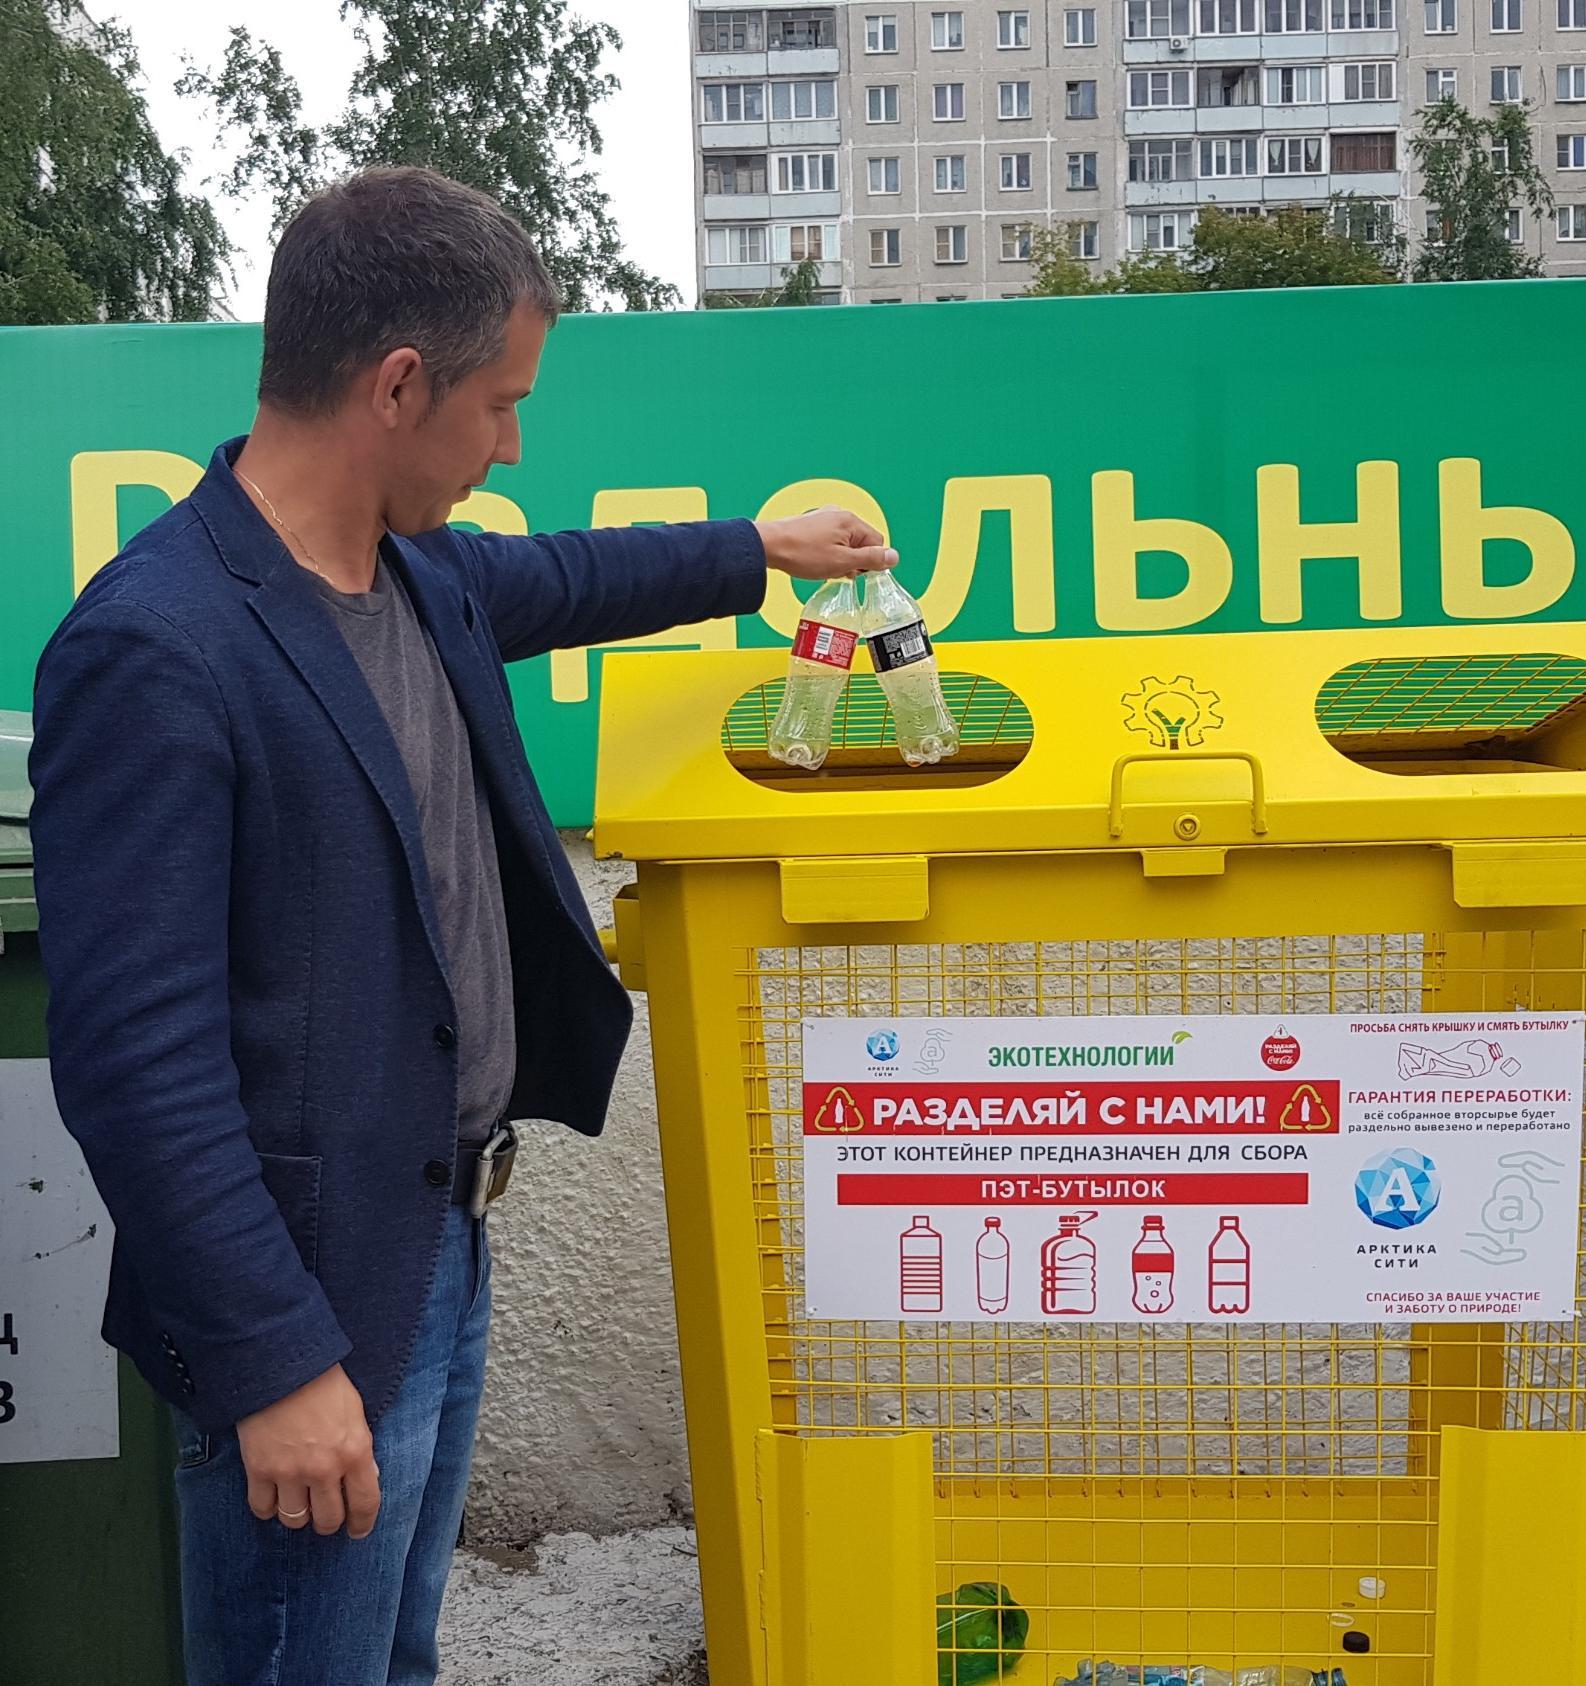 Как компания «Арктика Сити» из Новосибирска превращает мусор в отходы